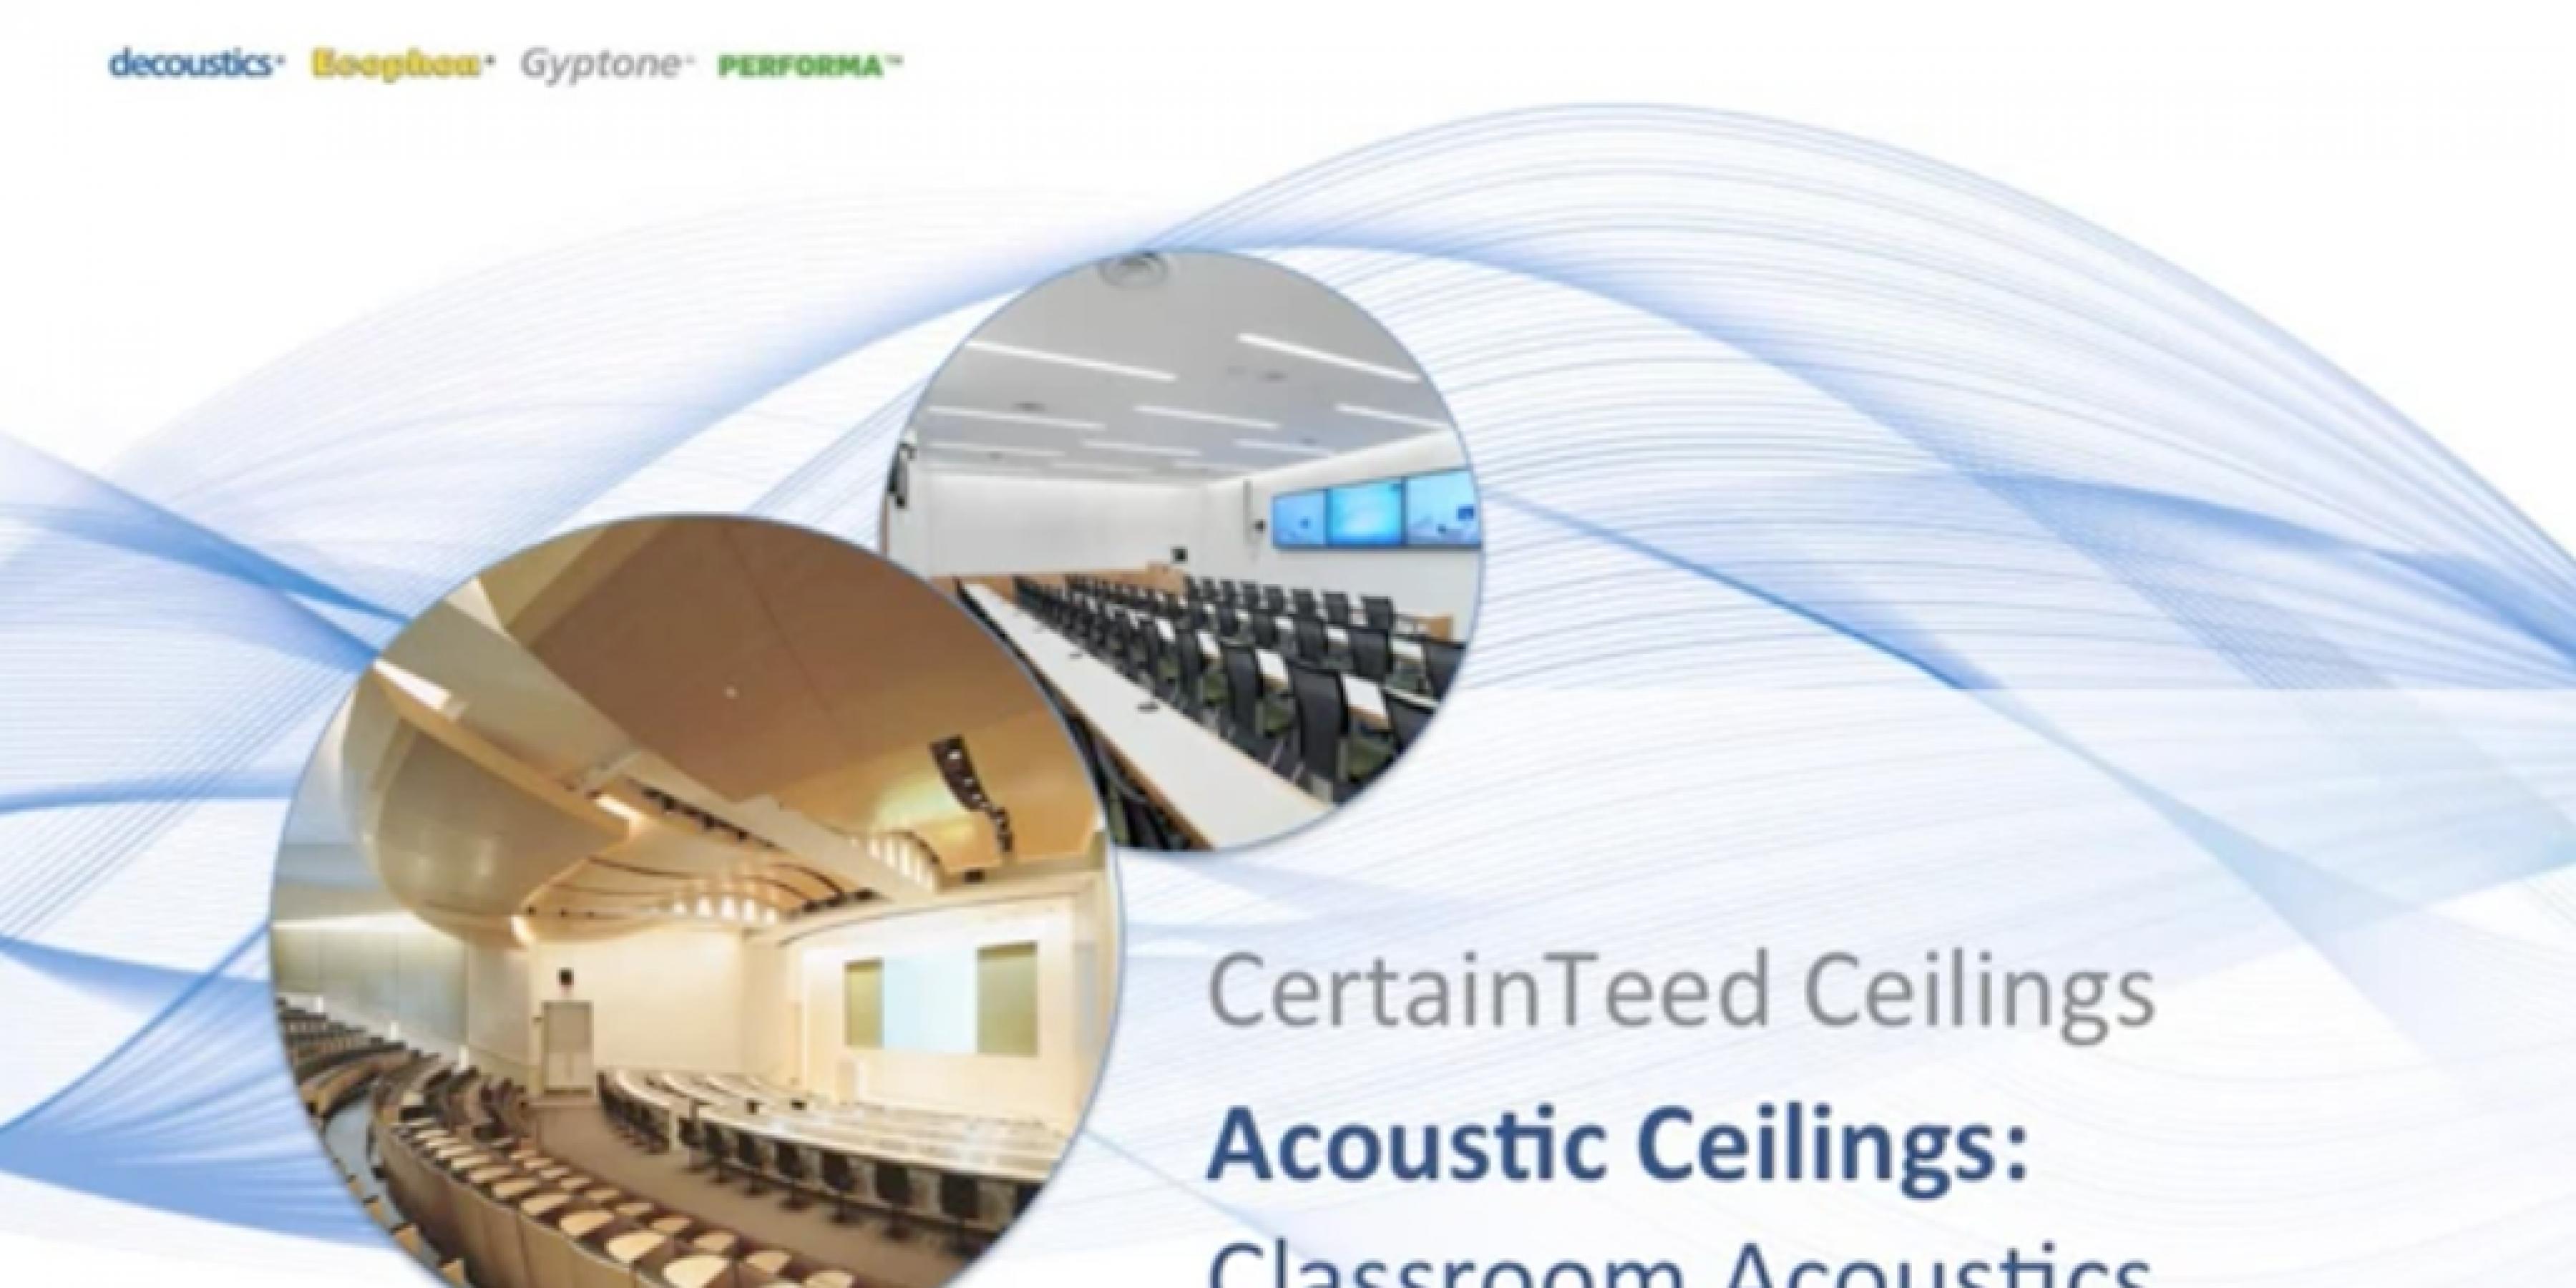 Classroom Acoustics Panel Discussion